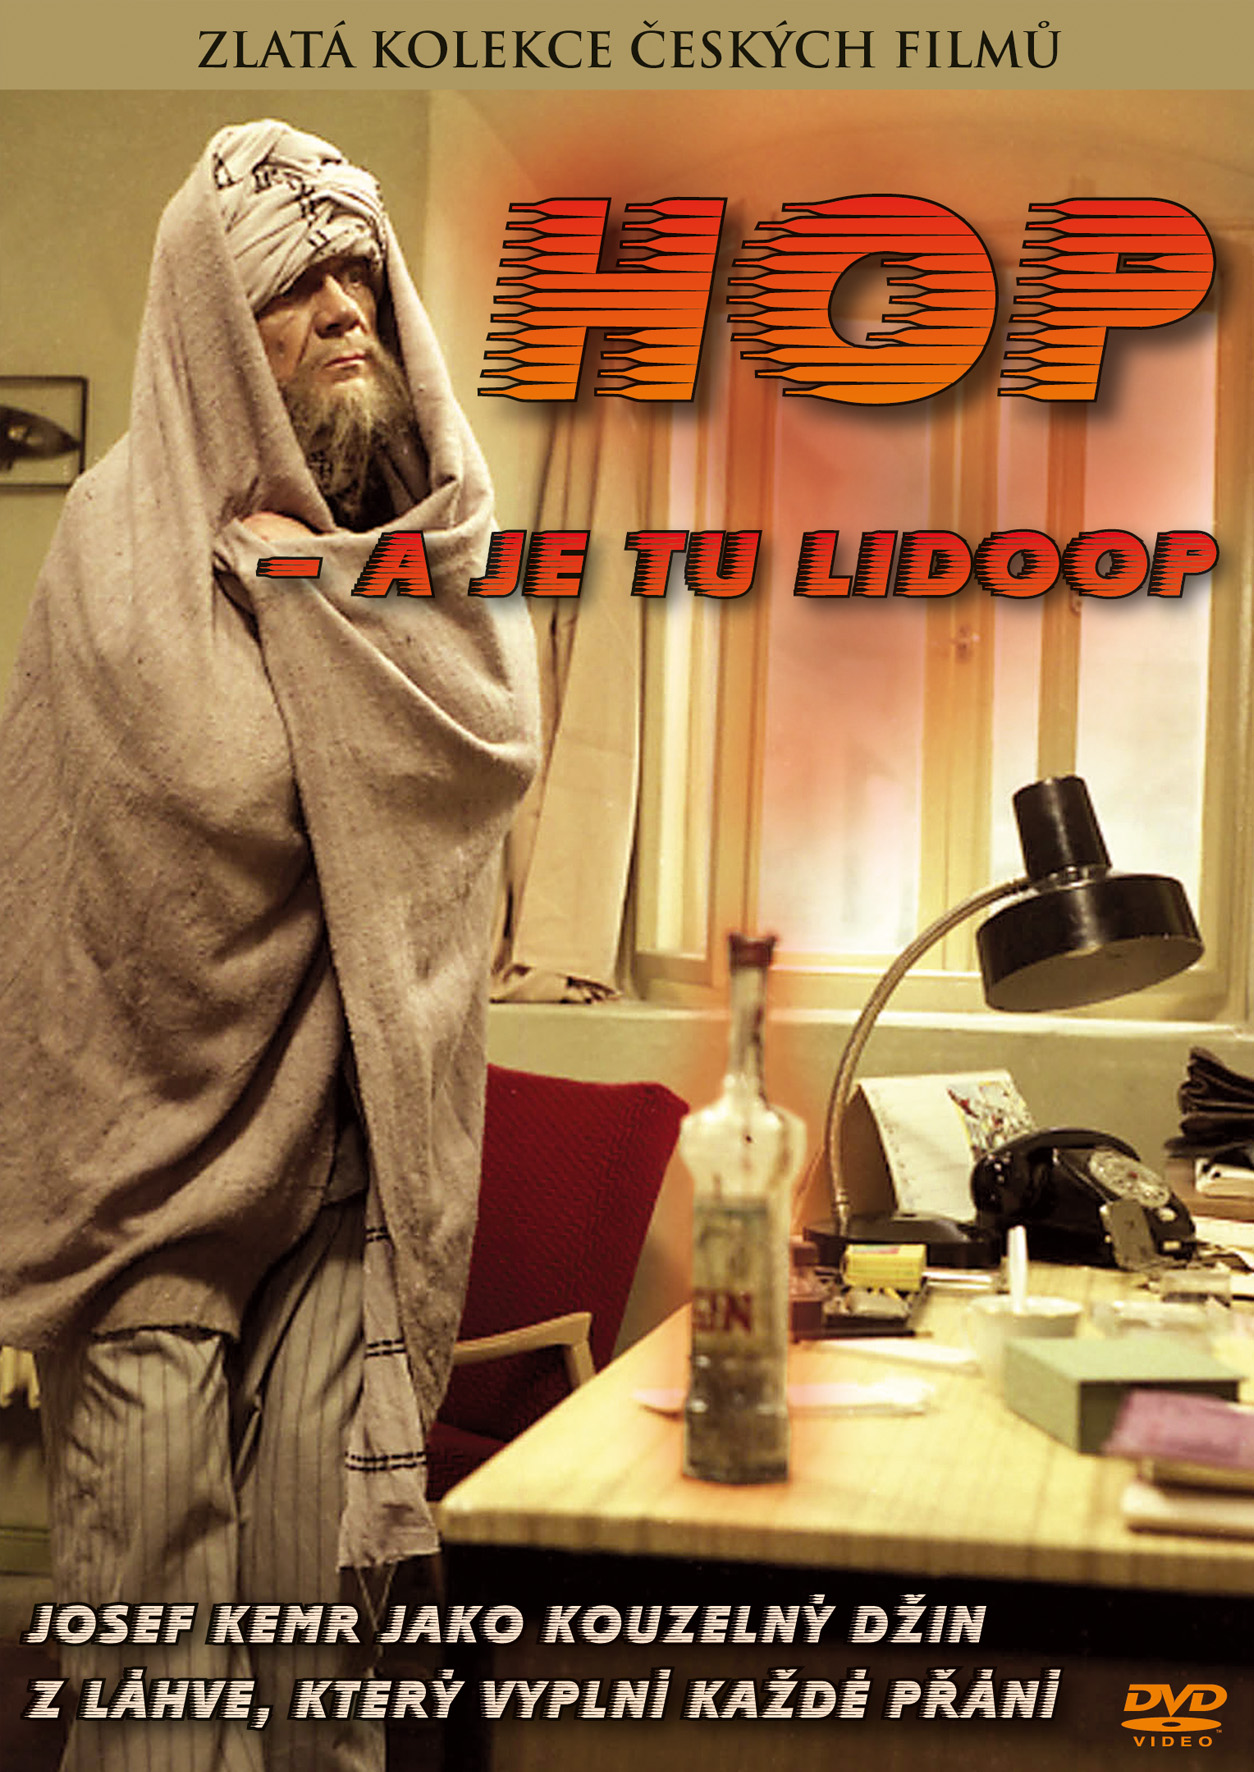 Spustit online film zdarma Hop - a je tu lidoop